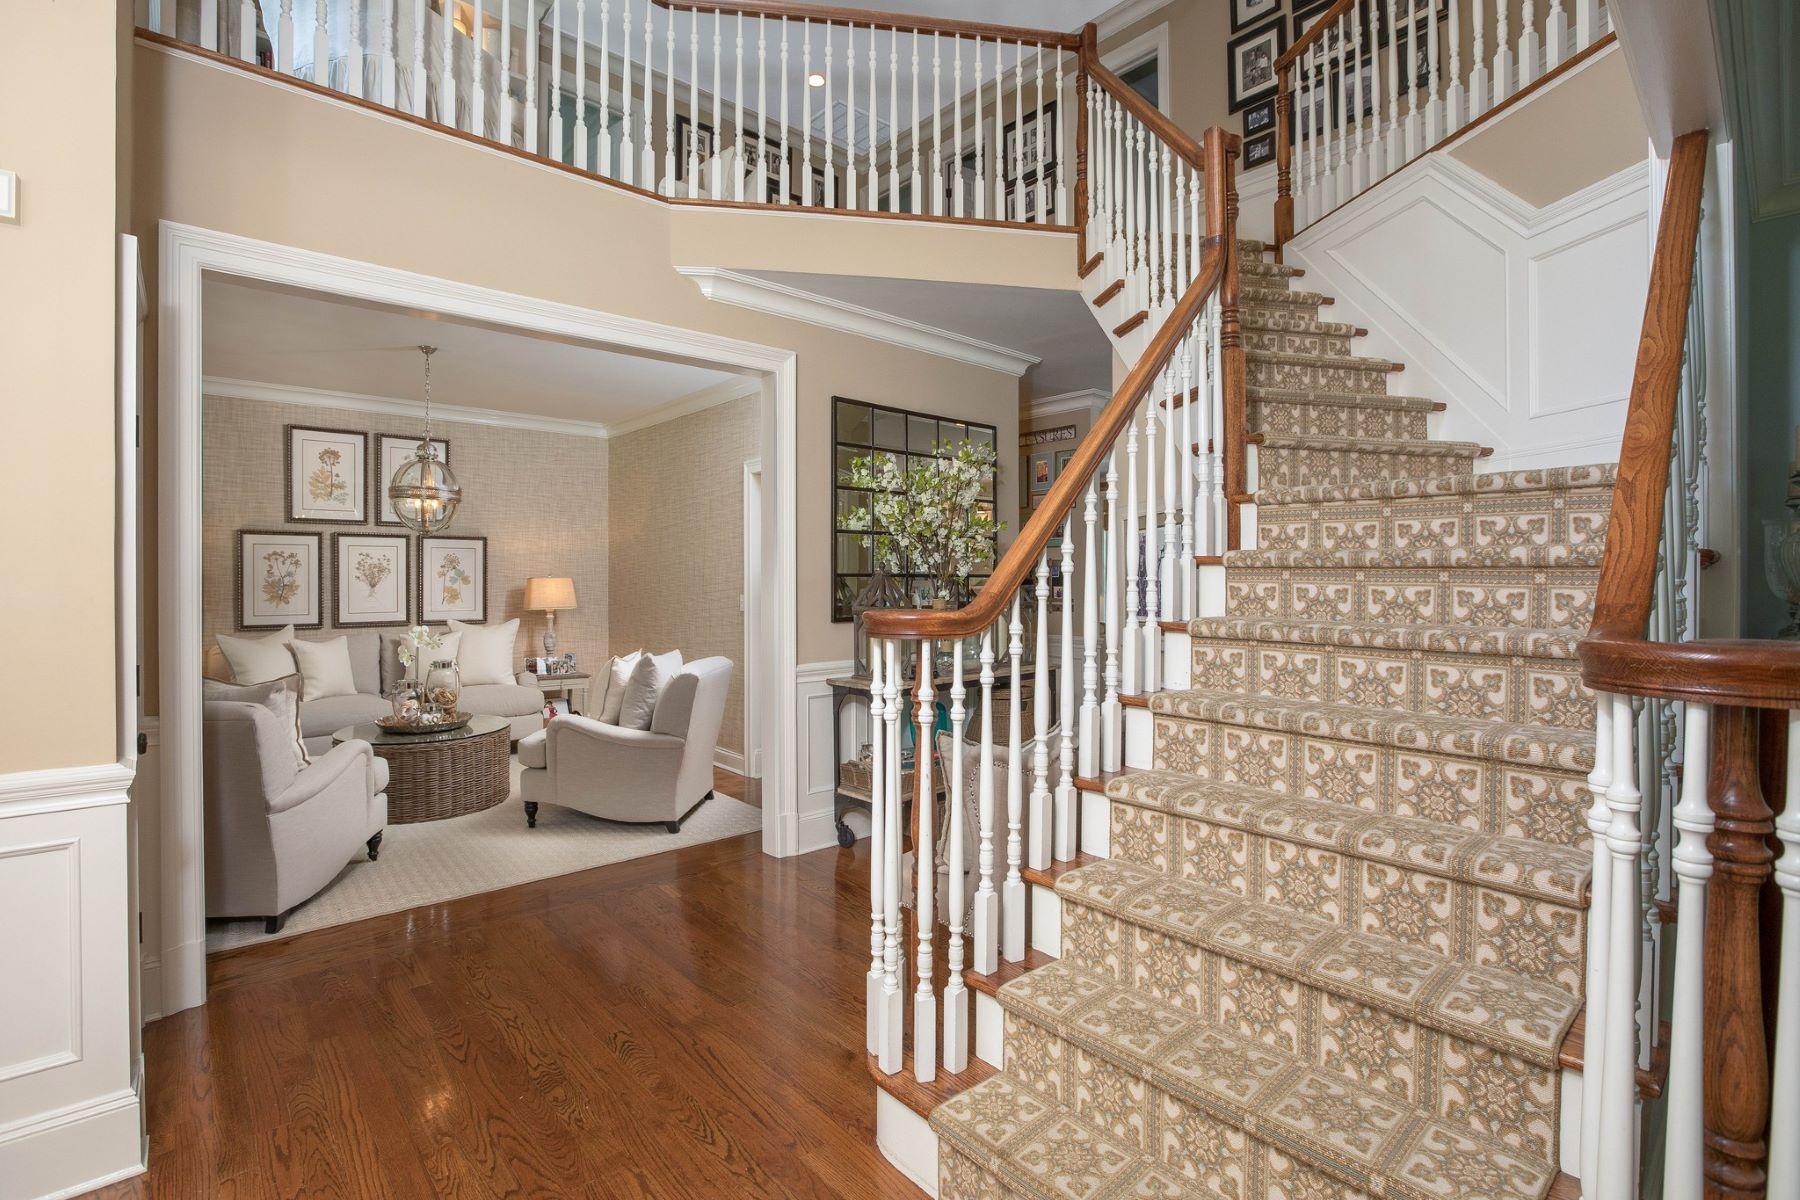 Single Family Homes for Active at Lloyd Neck 12 Mallard Dr Lloyd Neck, New York 11743 United States